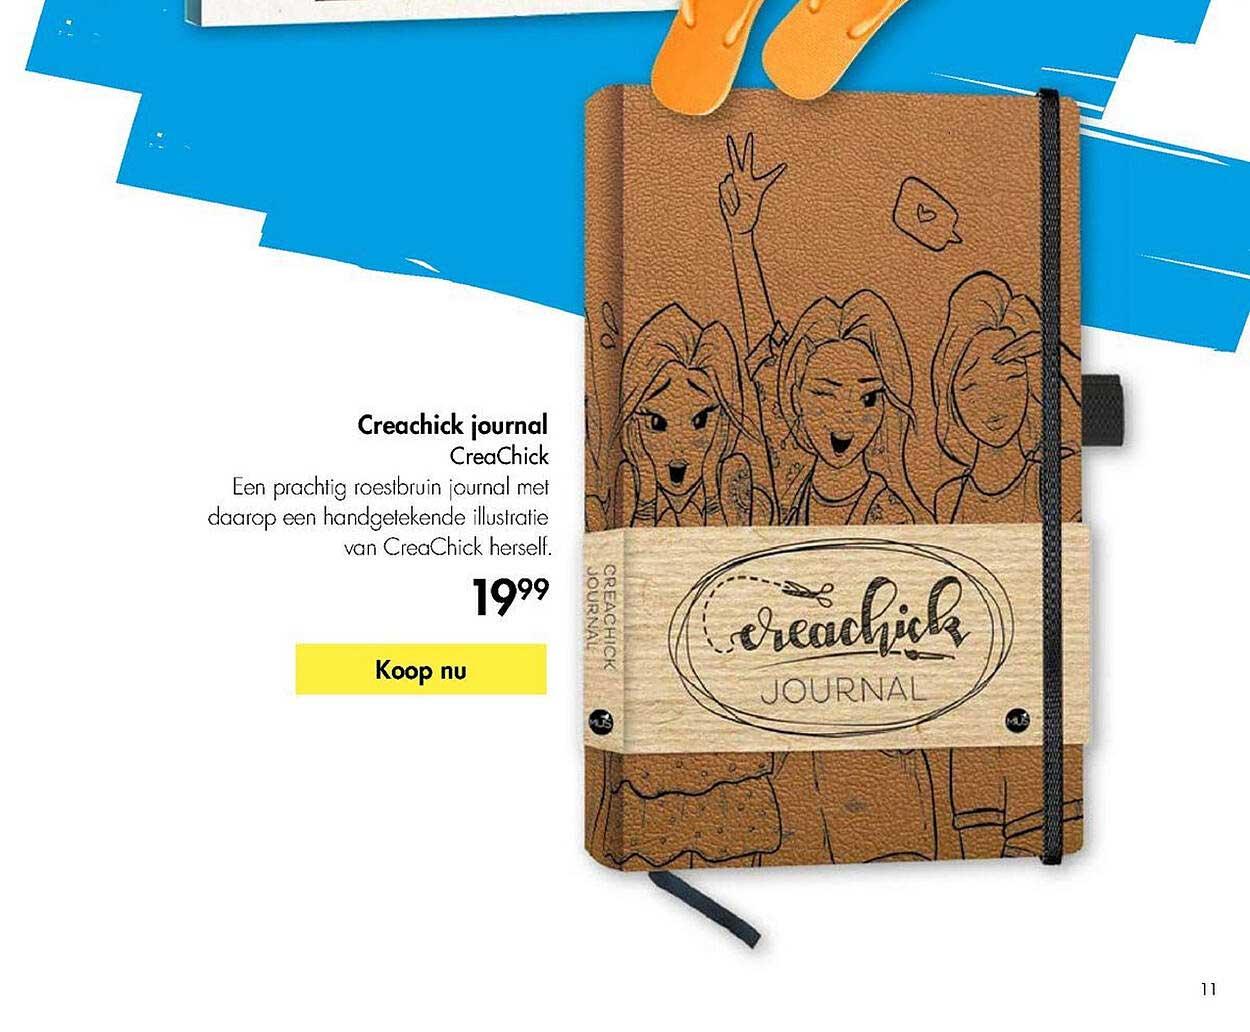 The Read Shop Creachick Journal - CreaChick